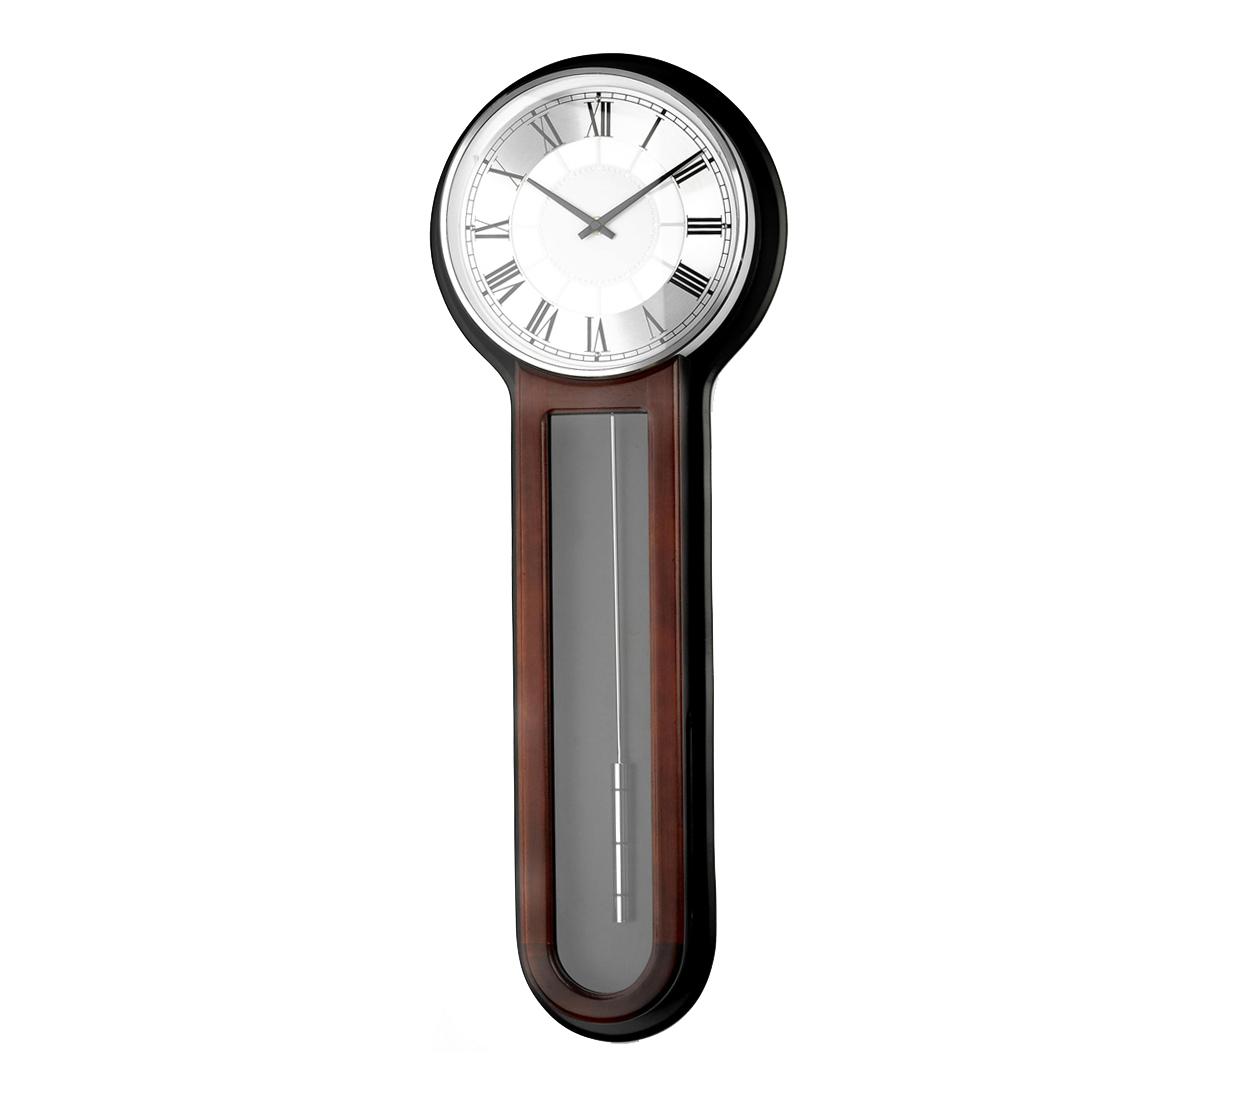 Reloj de pared con p ndulo seiko 70cm envio gratis - Relojes rusticos de pared ...